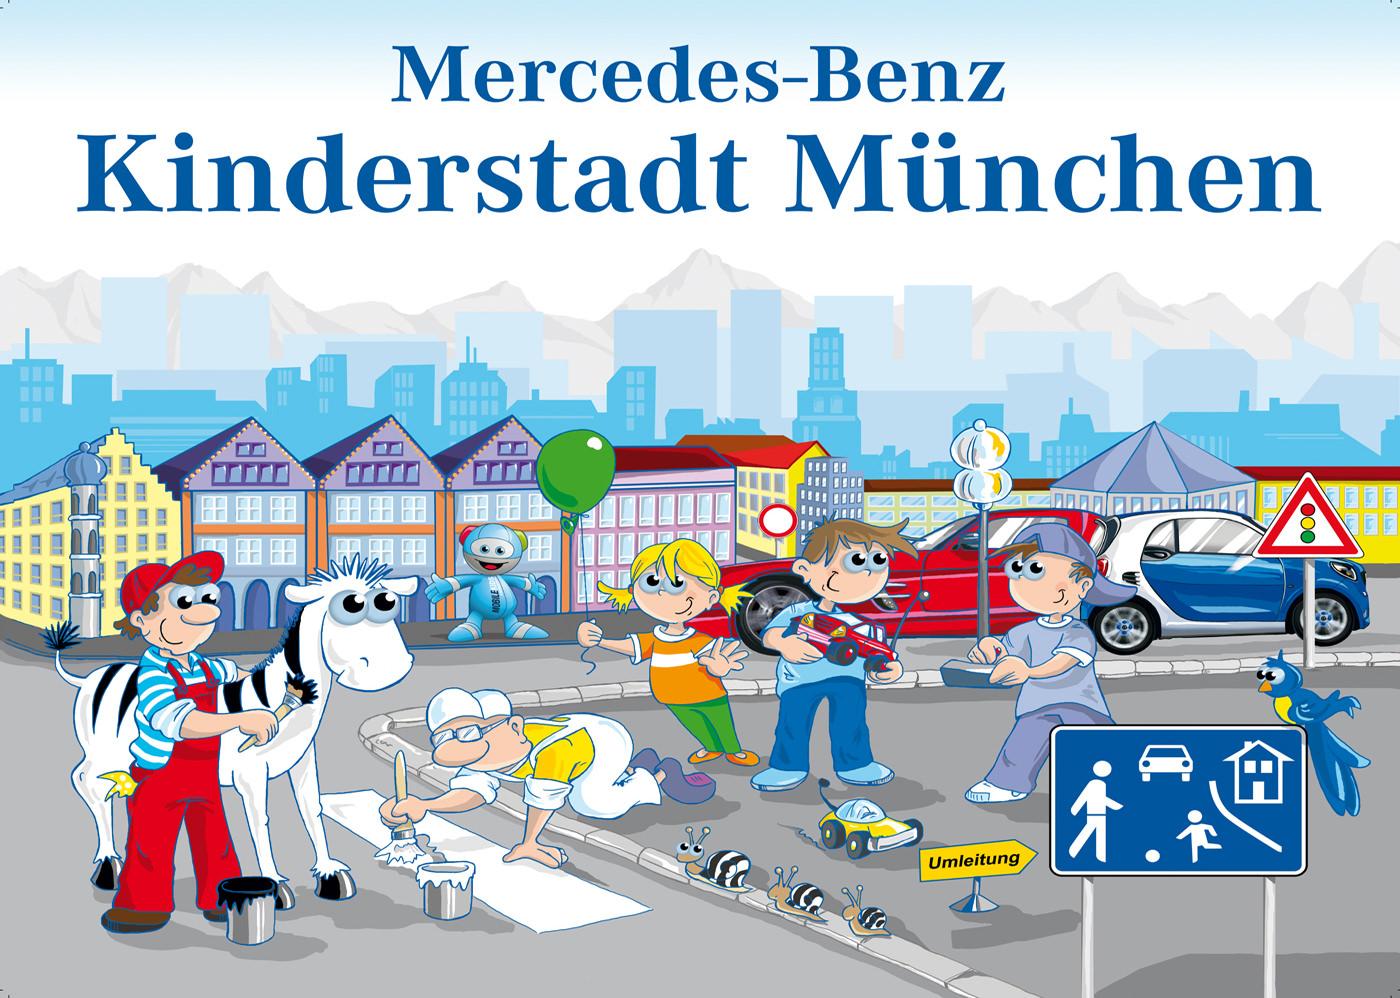 Ravernsburger Marken Erlebniswelt - Mercerdes Benz Kinderstadt